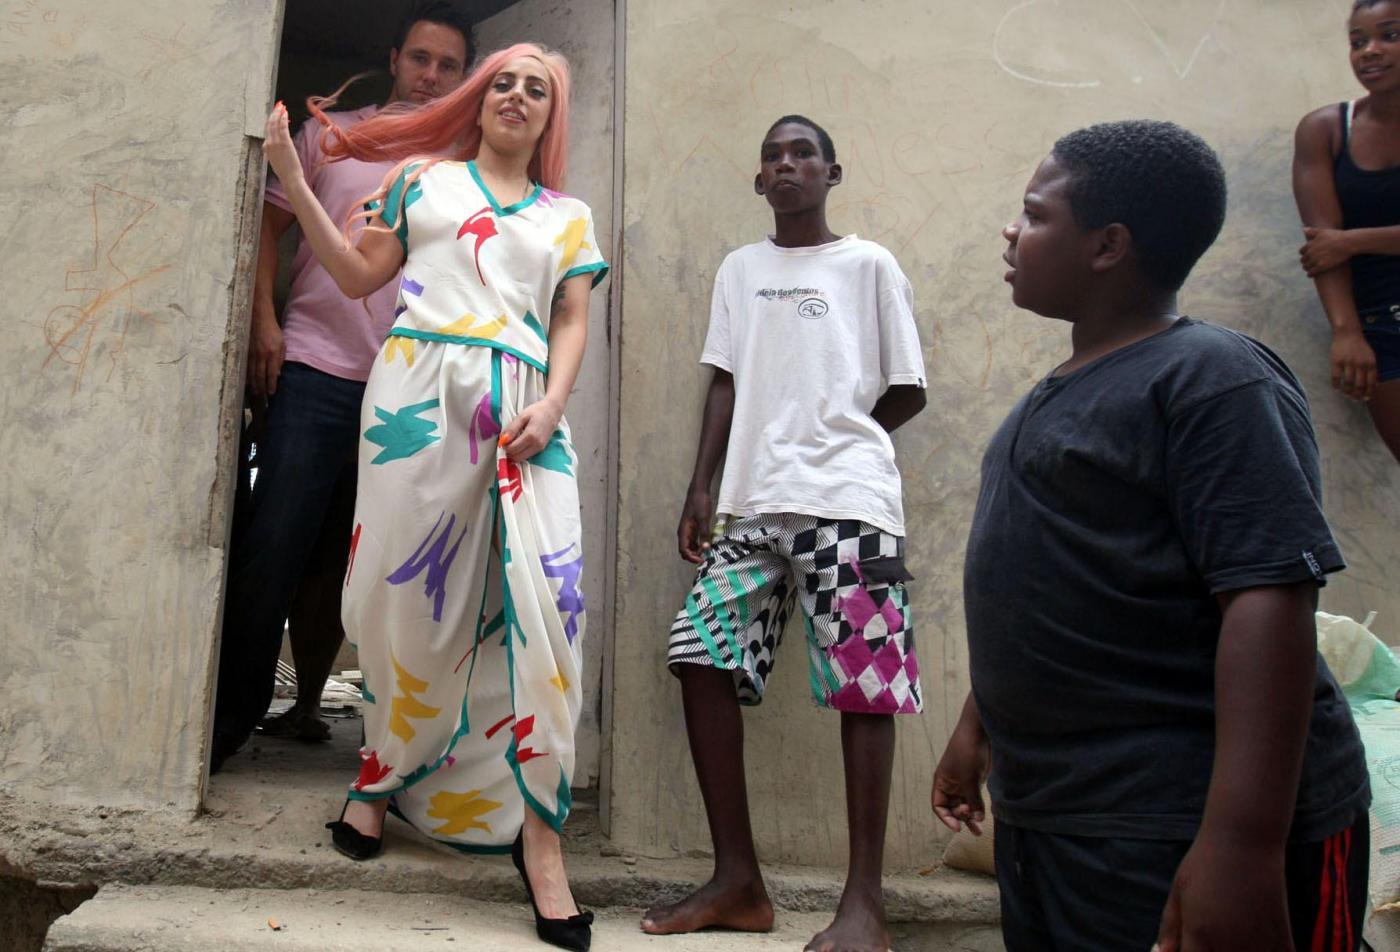 Lady Gaga a piedi nudi a Rio de Janeiro03